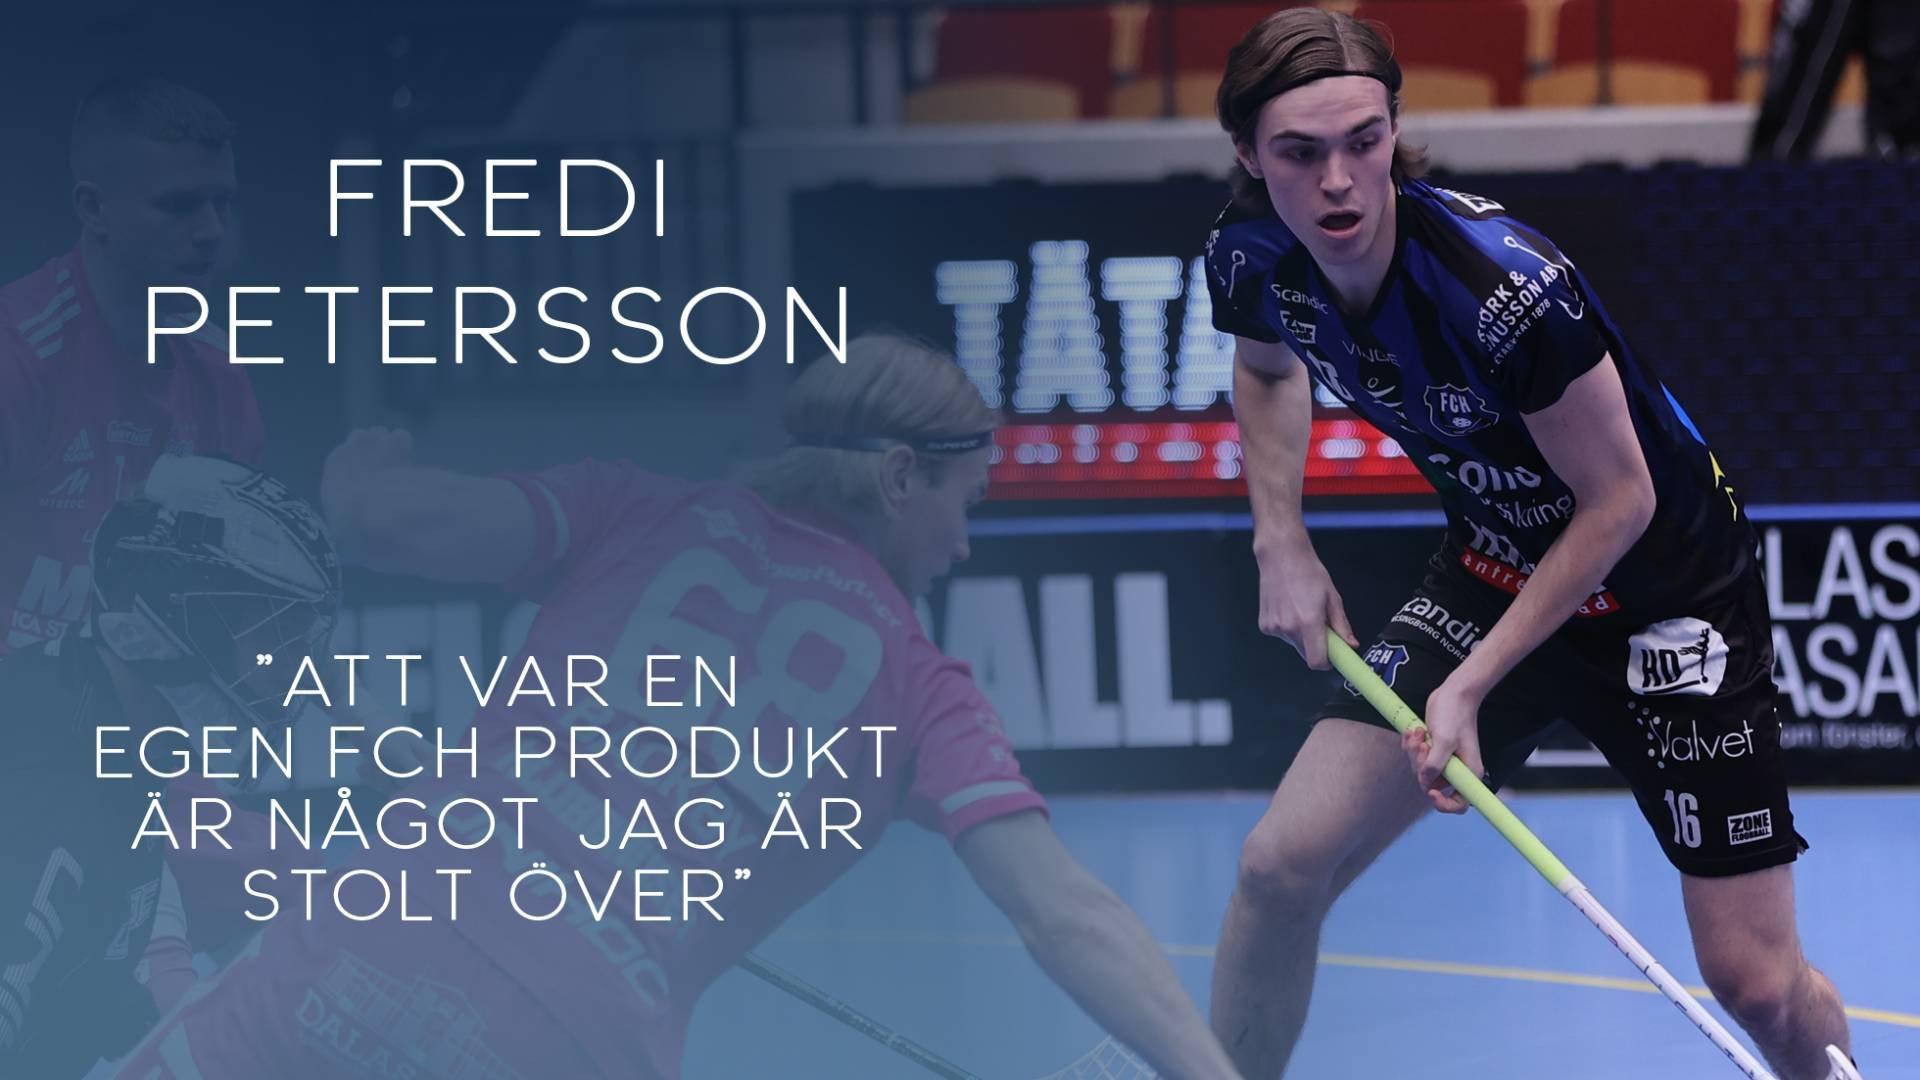 Fredi Petersson förlänger